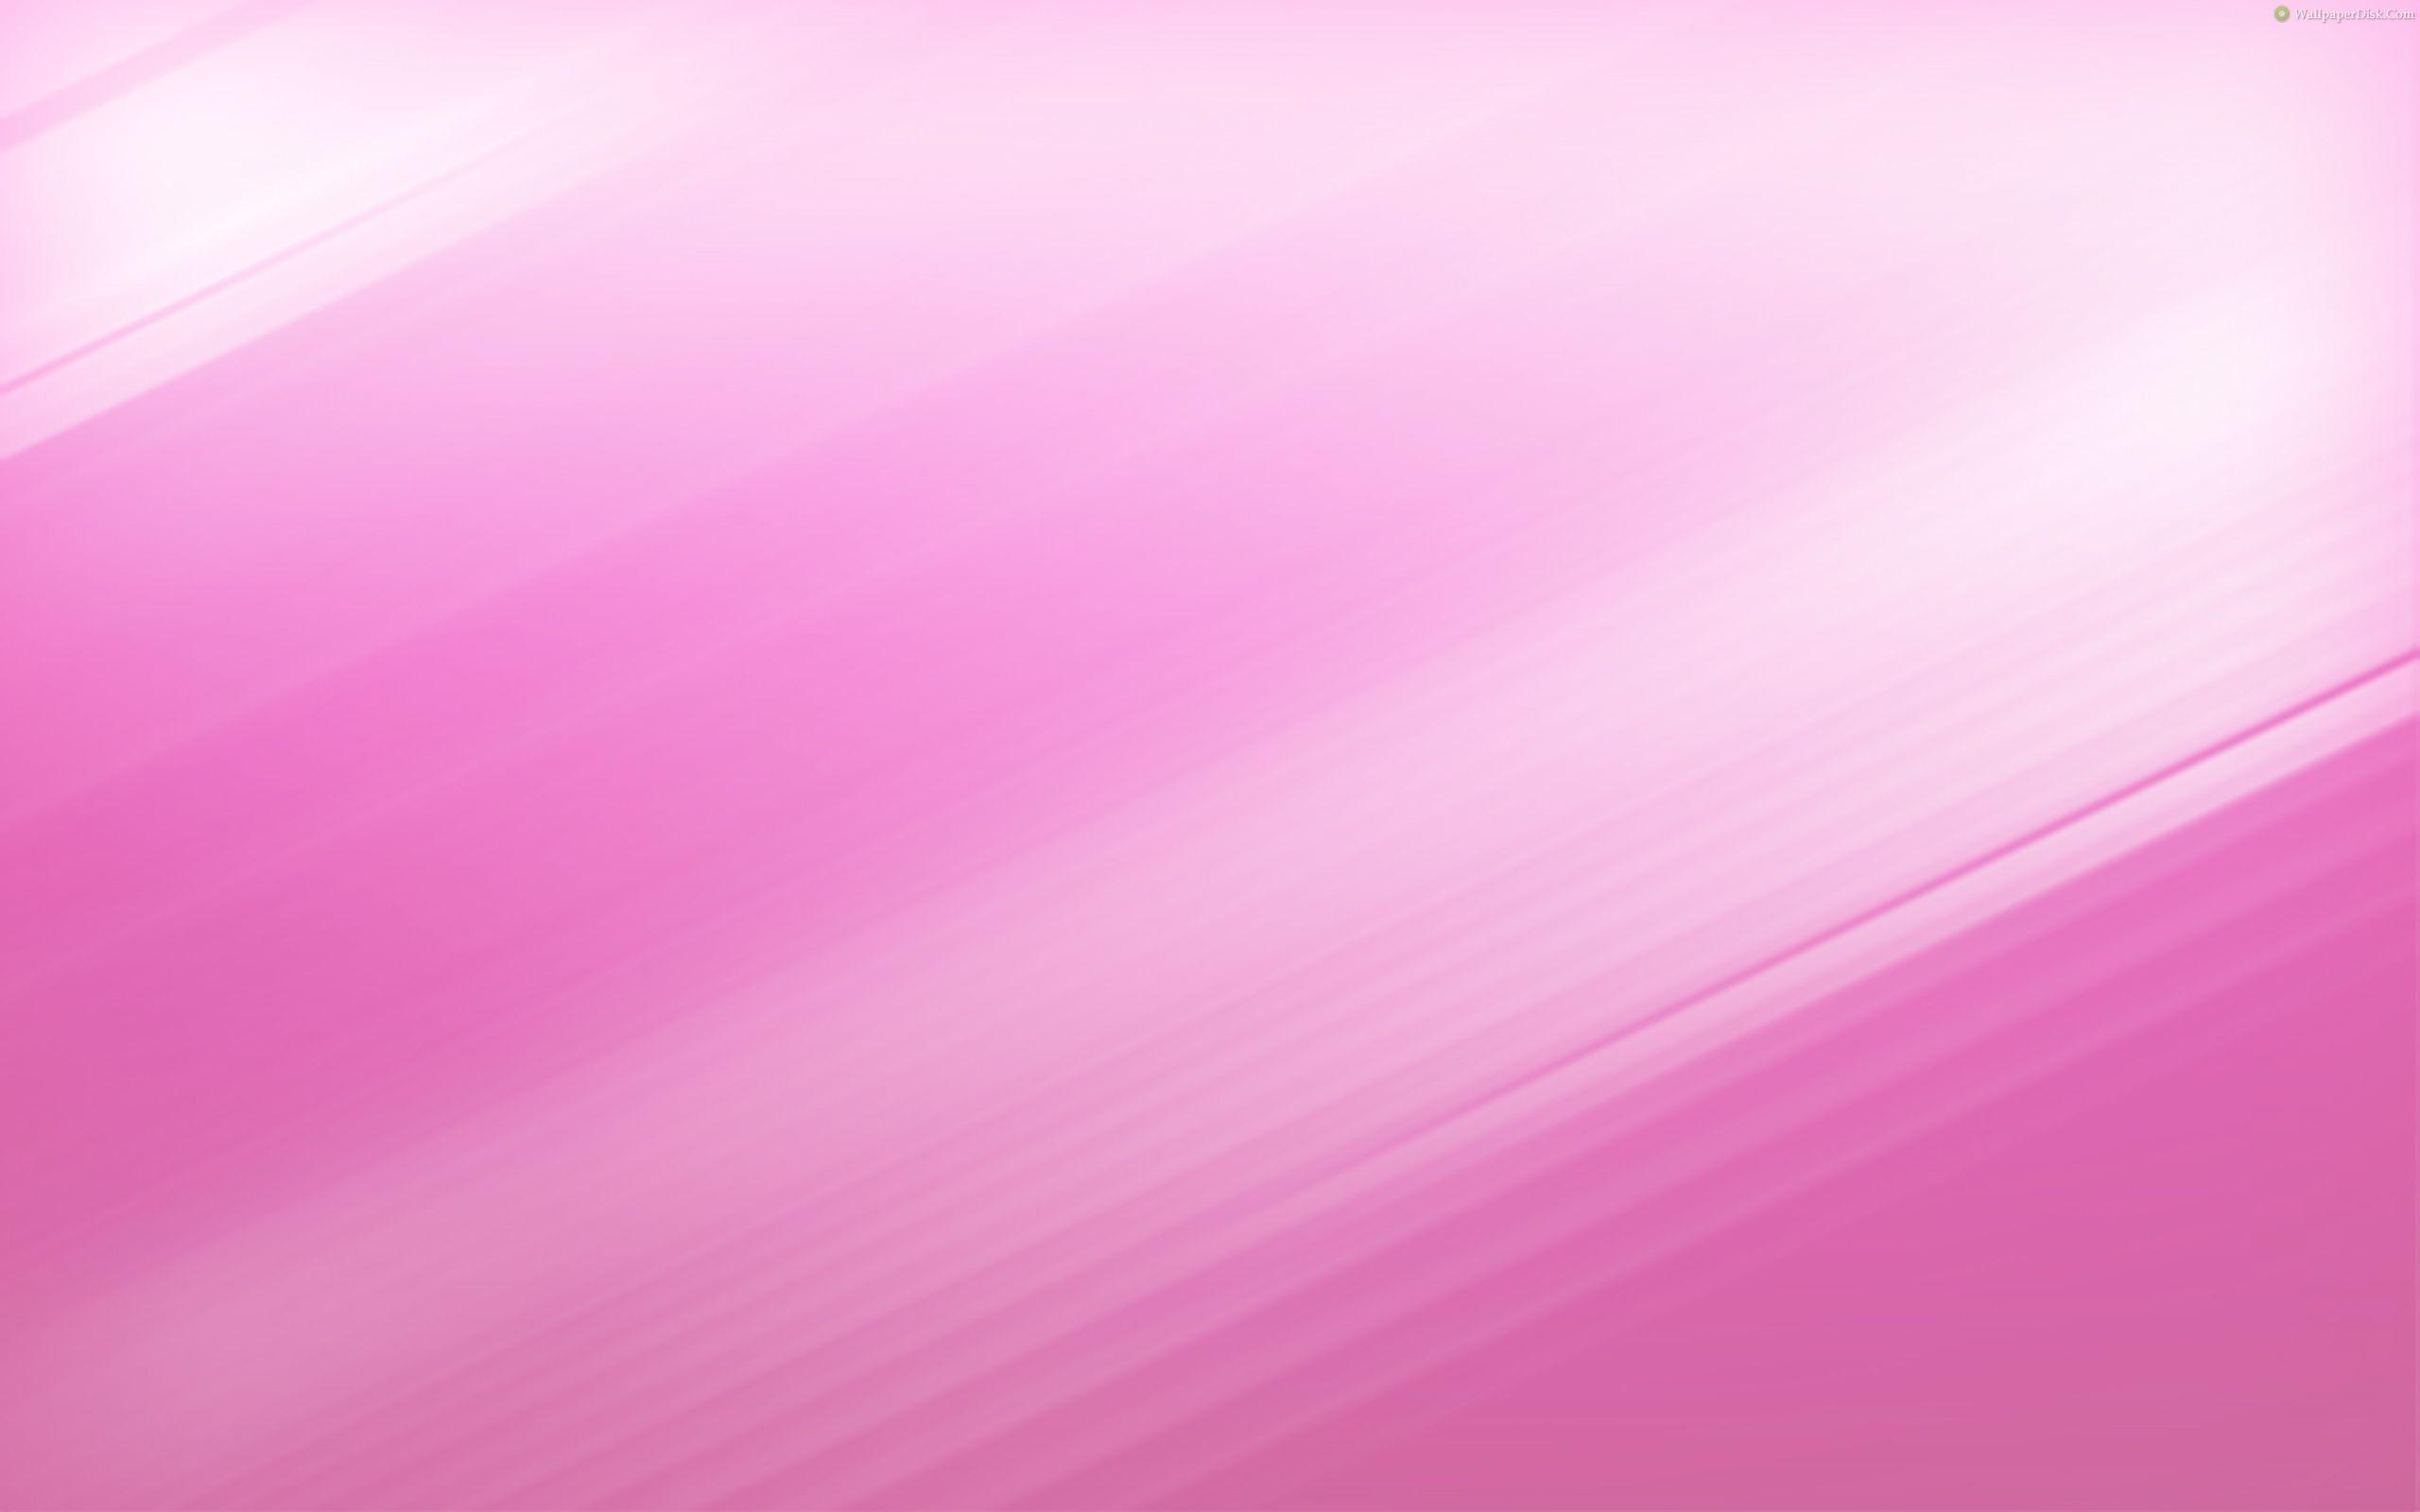 To set this wallpaper as your desktop wallpaper 2560x1600